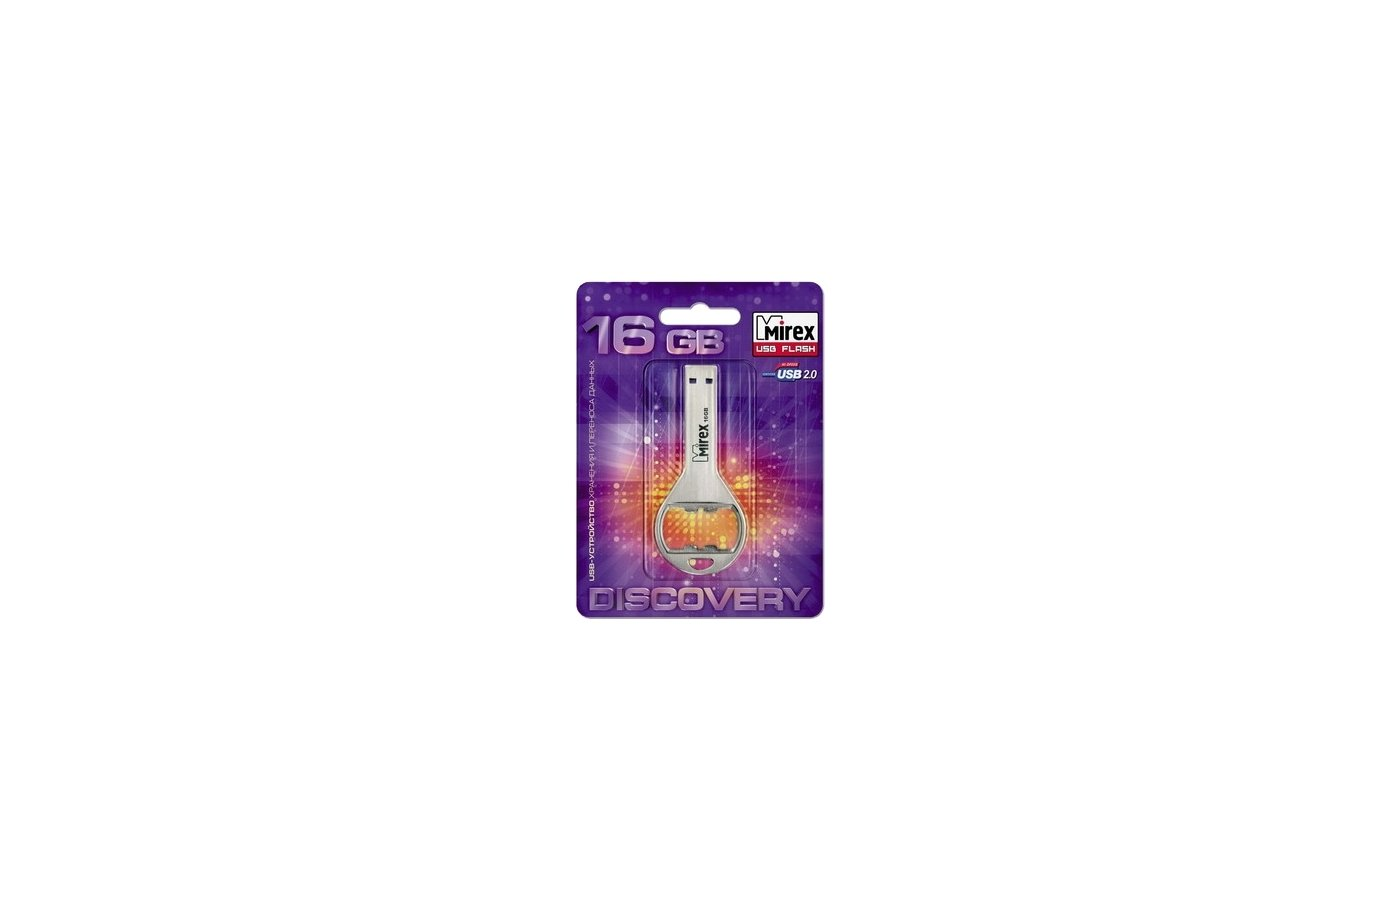 Флеш-диск Mirex 16Gb Bottle Opener